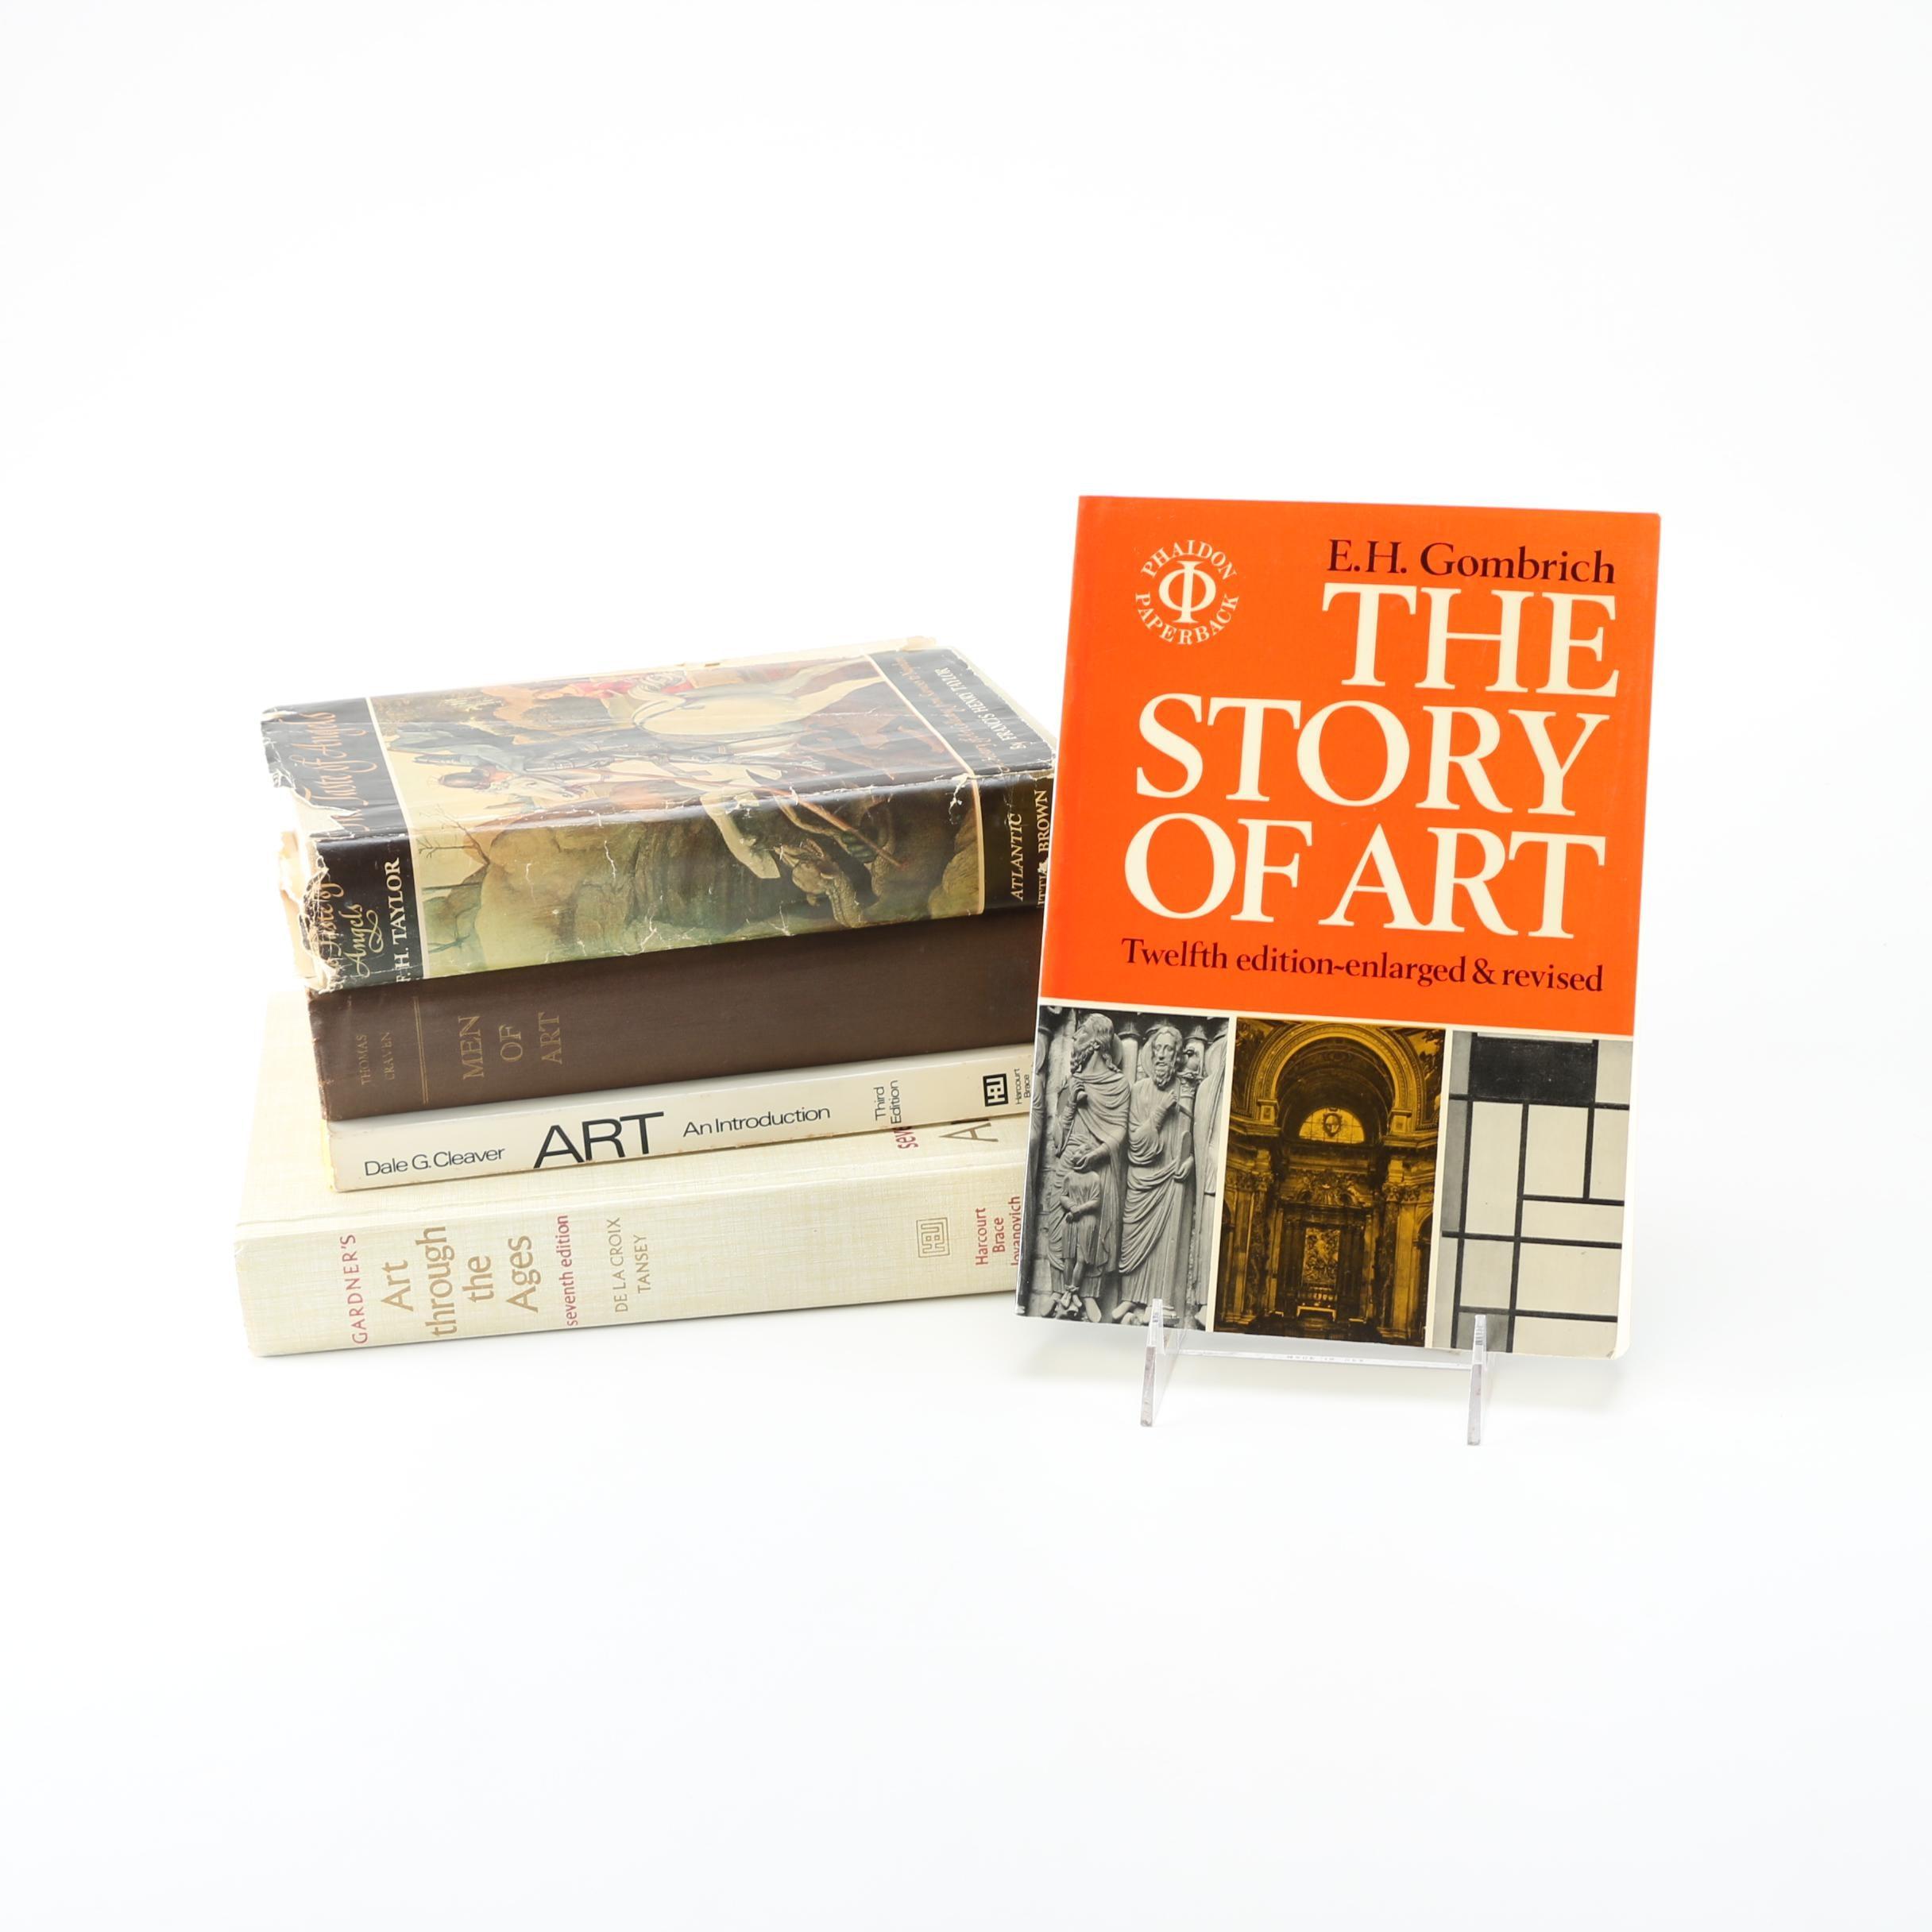 Books on Art History